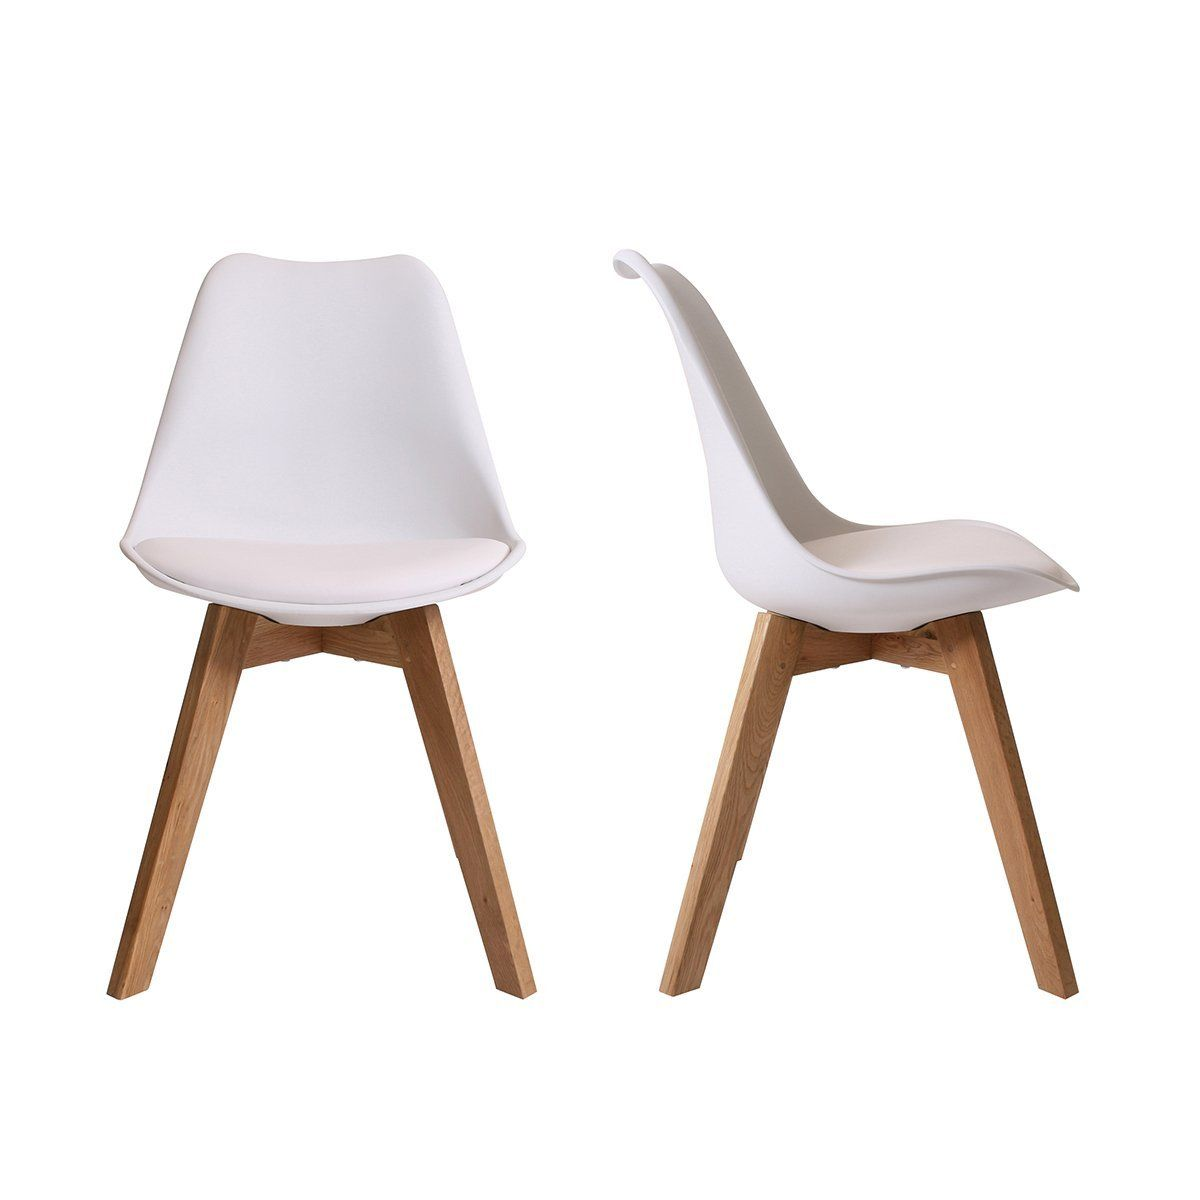 Moderner Design Esszimmerstuhl Consillium Valido (2er Set) / Holz   Maße  83x48x39 Cm (